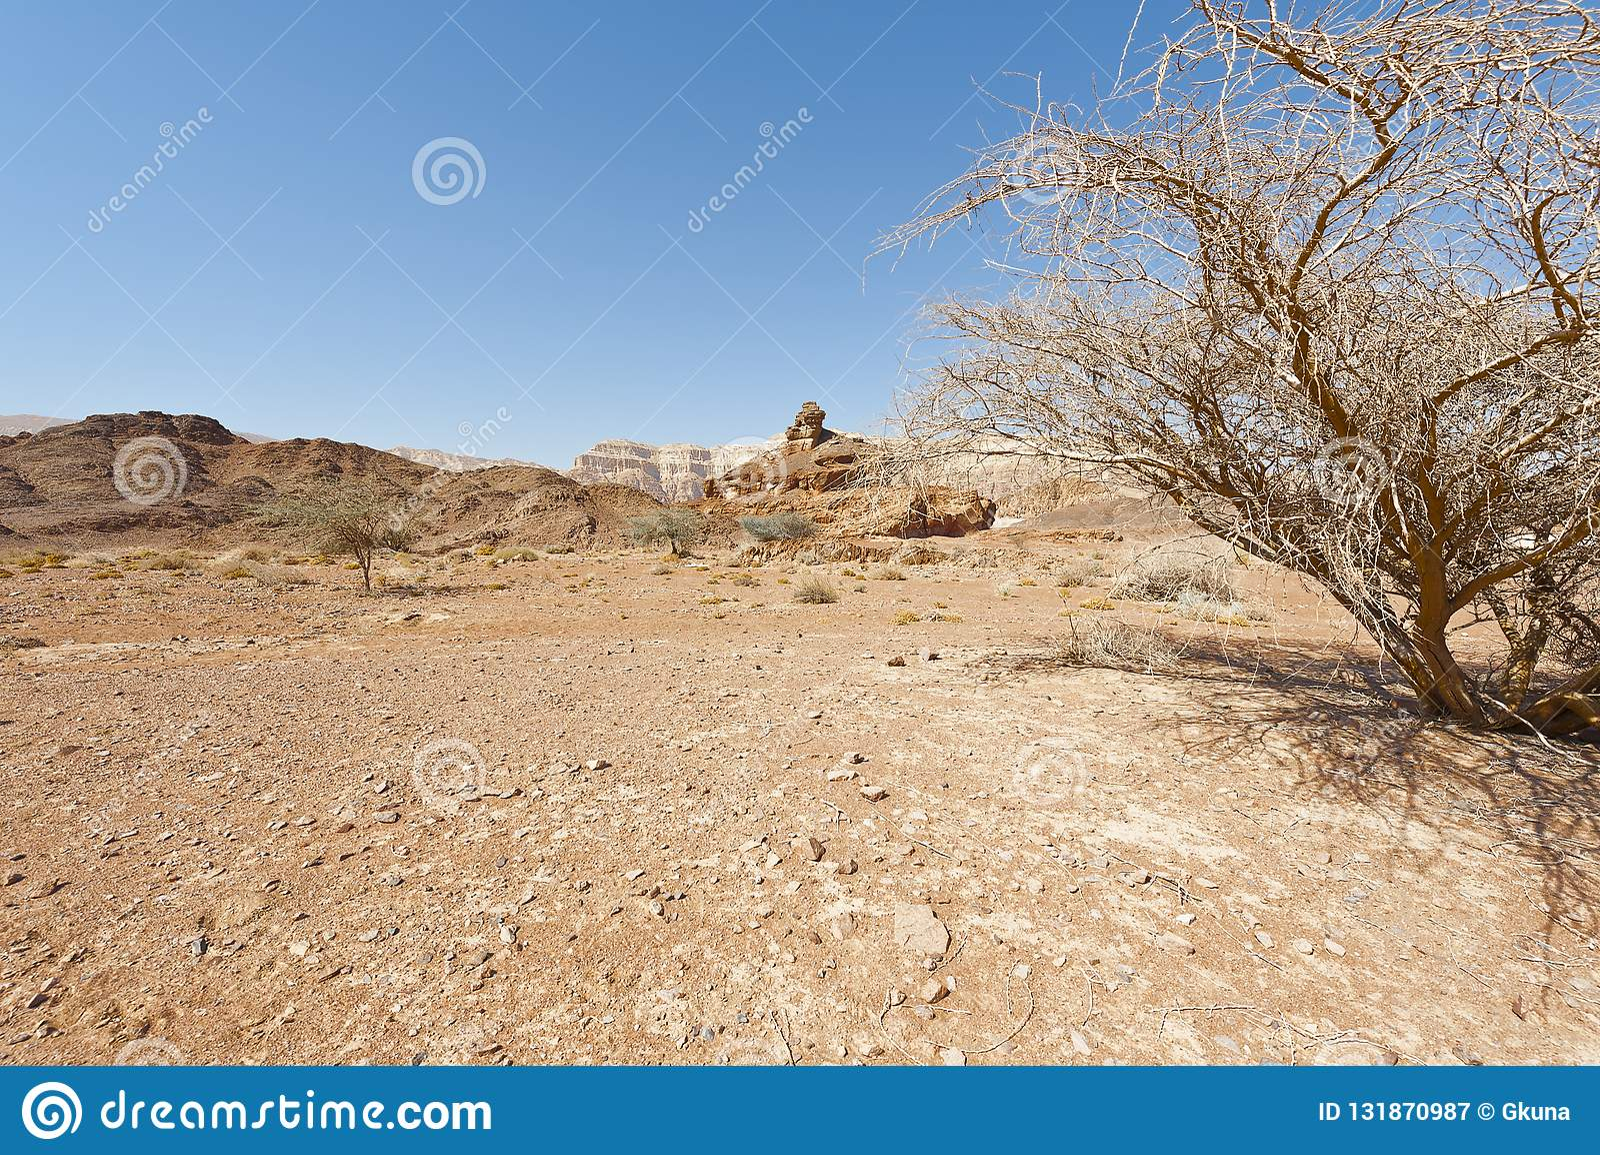 Melancholie en leegte van de woestijn in Israël